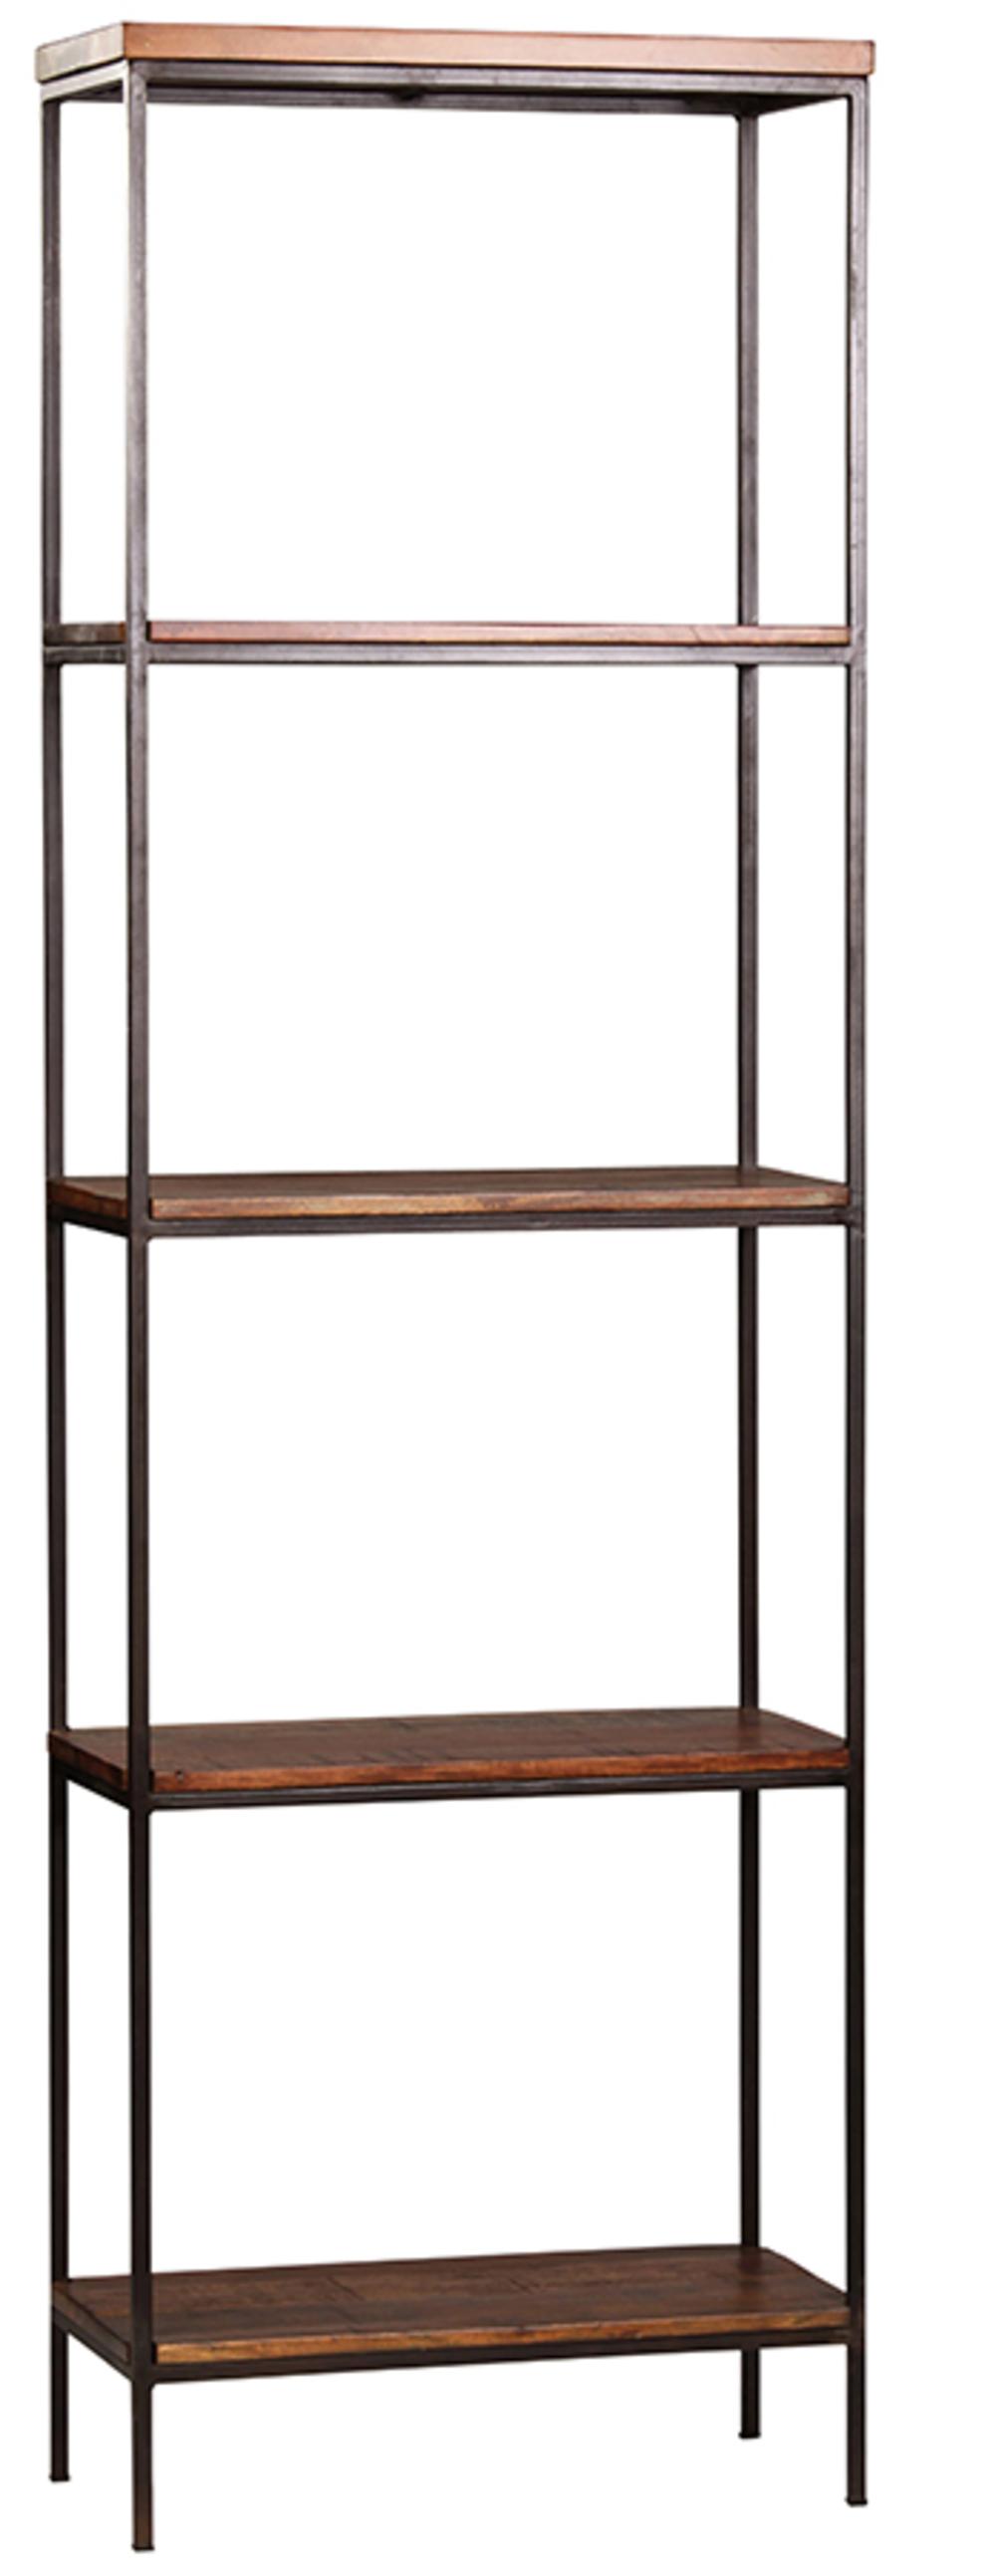 Dovetail Furniture - Madison Bookcase